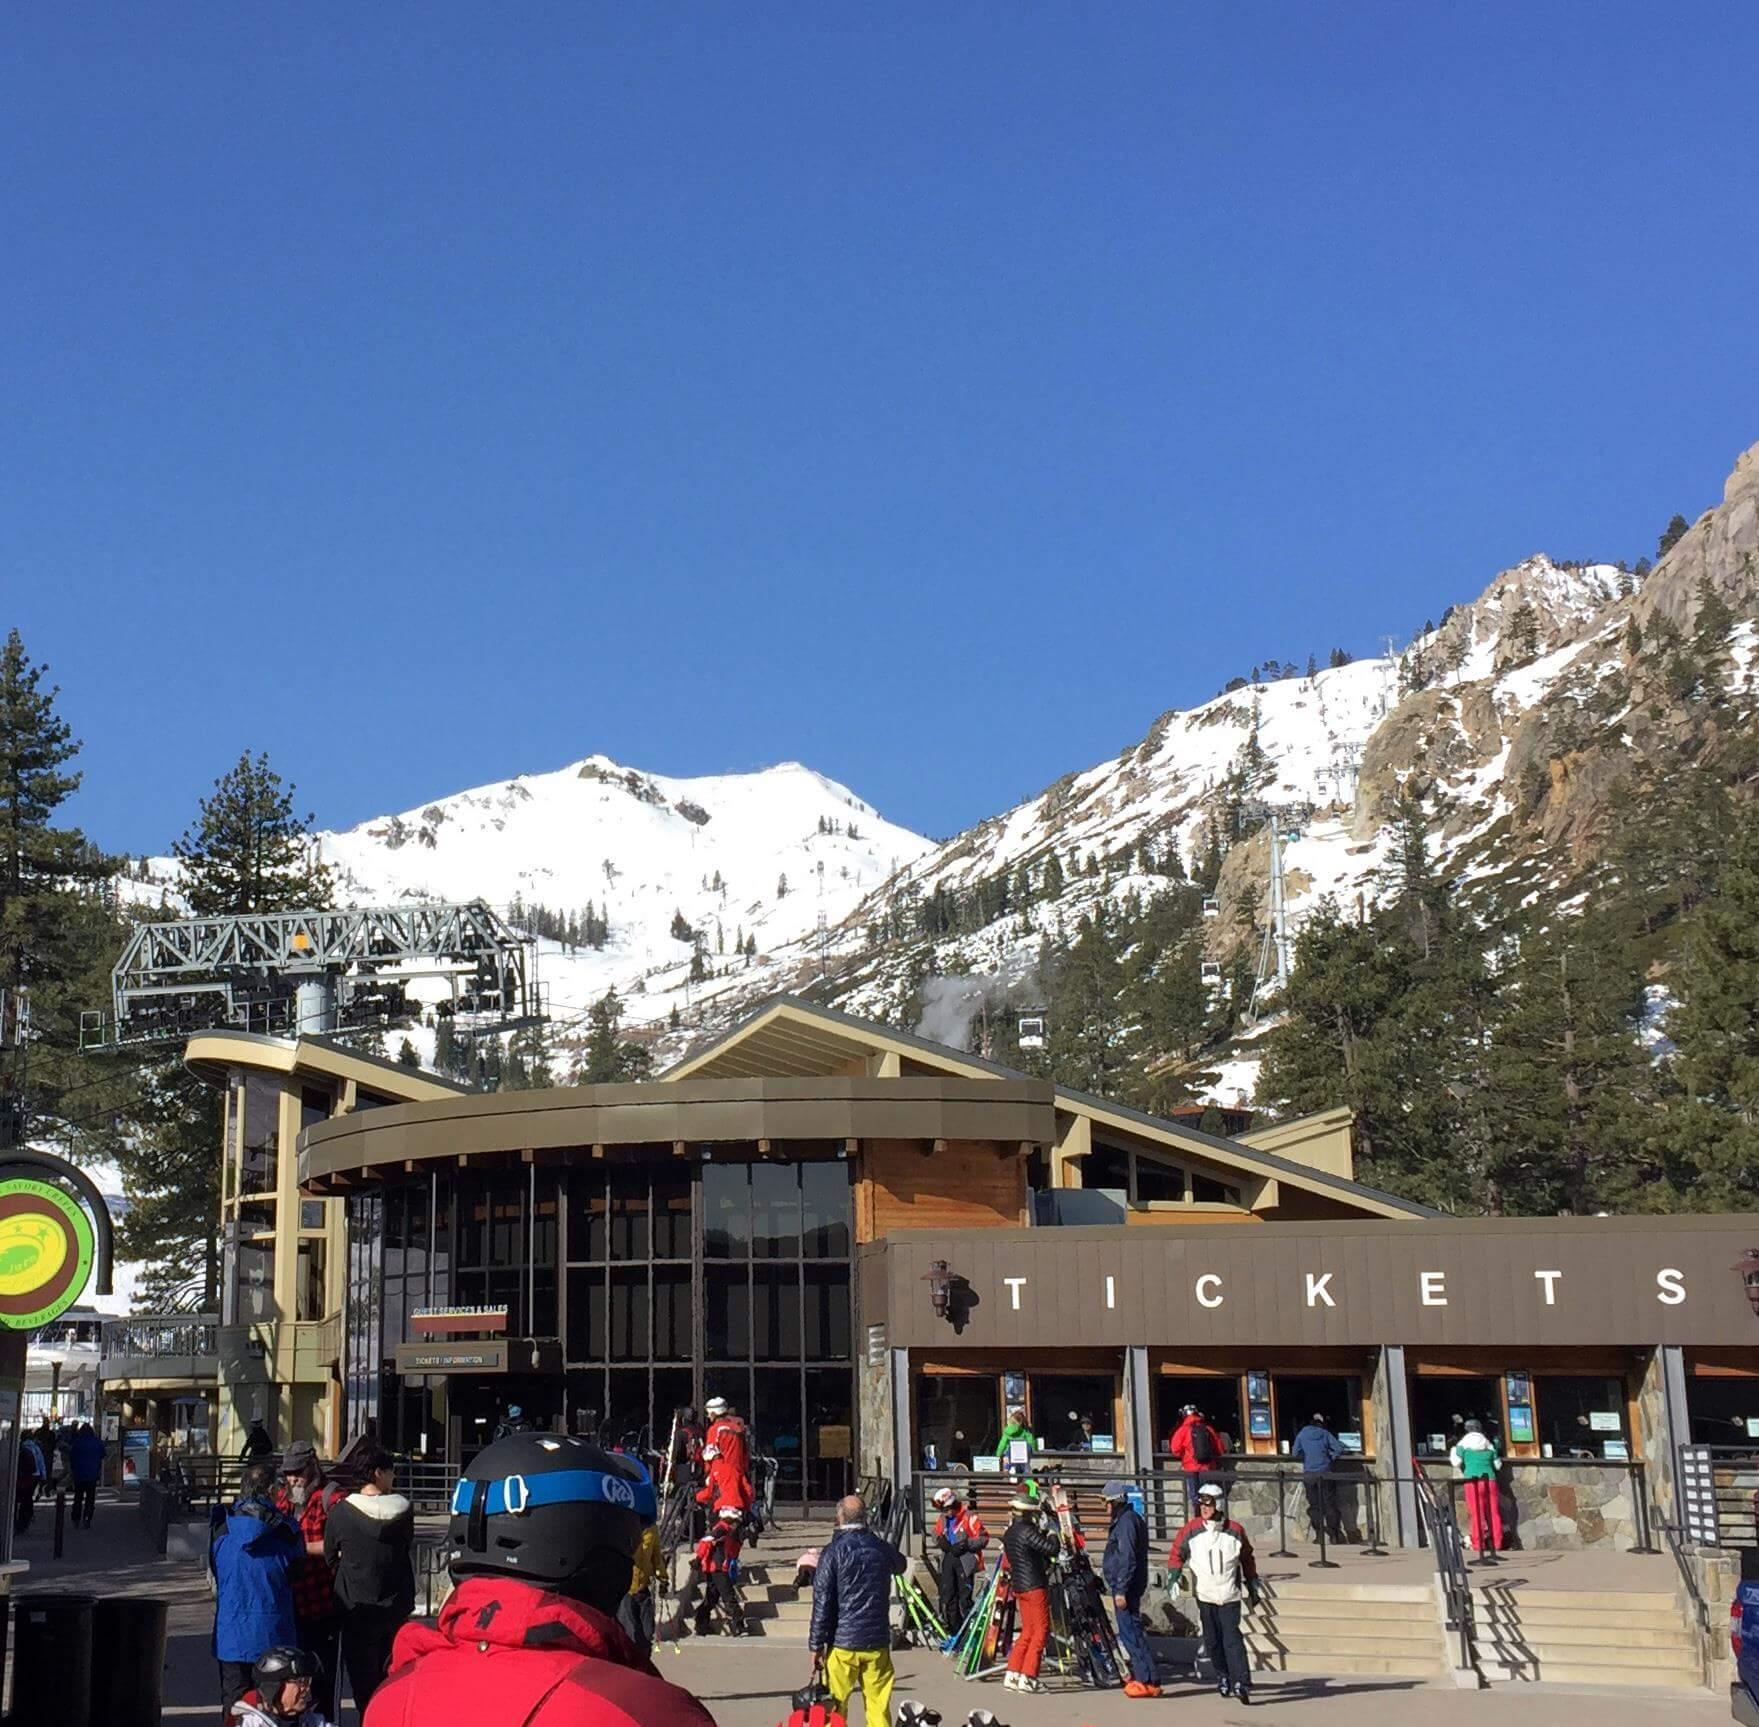 Squaw Valley Spring Skiing Lake Tahoe California